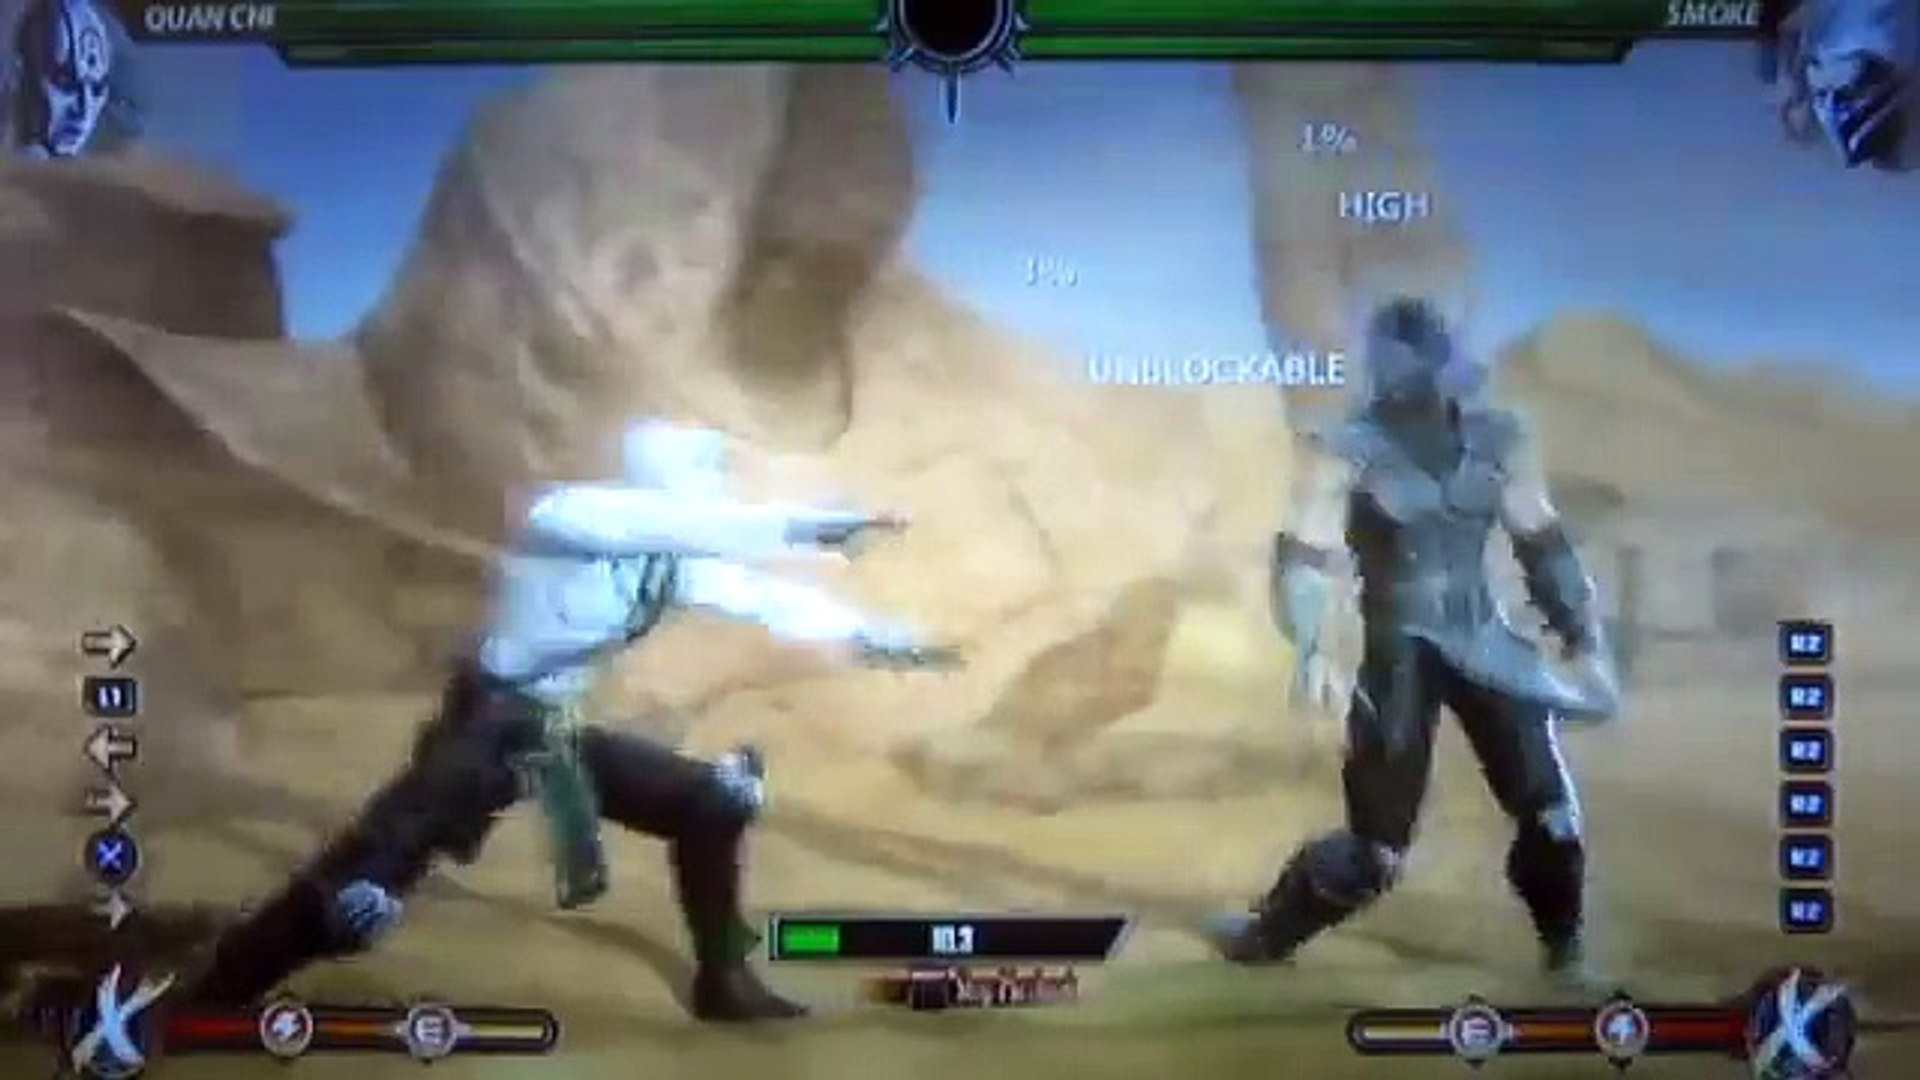 (PATCHED) Mortal Kombat 9 - Noob Saibot/Quan Chi: Tag Team Infinite (PATCHED)